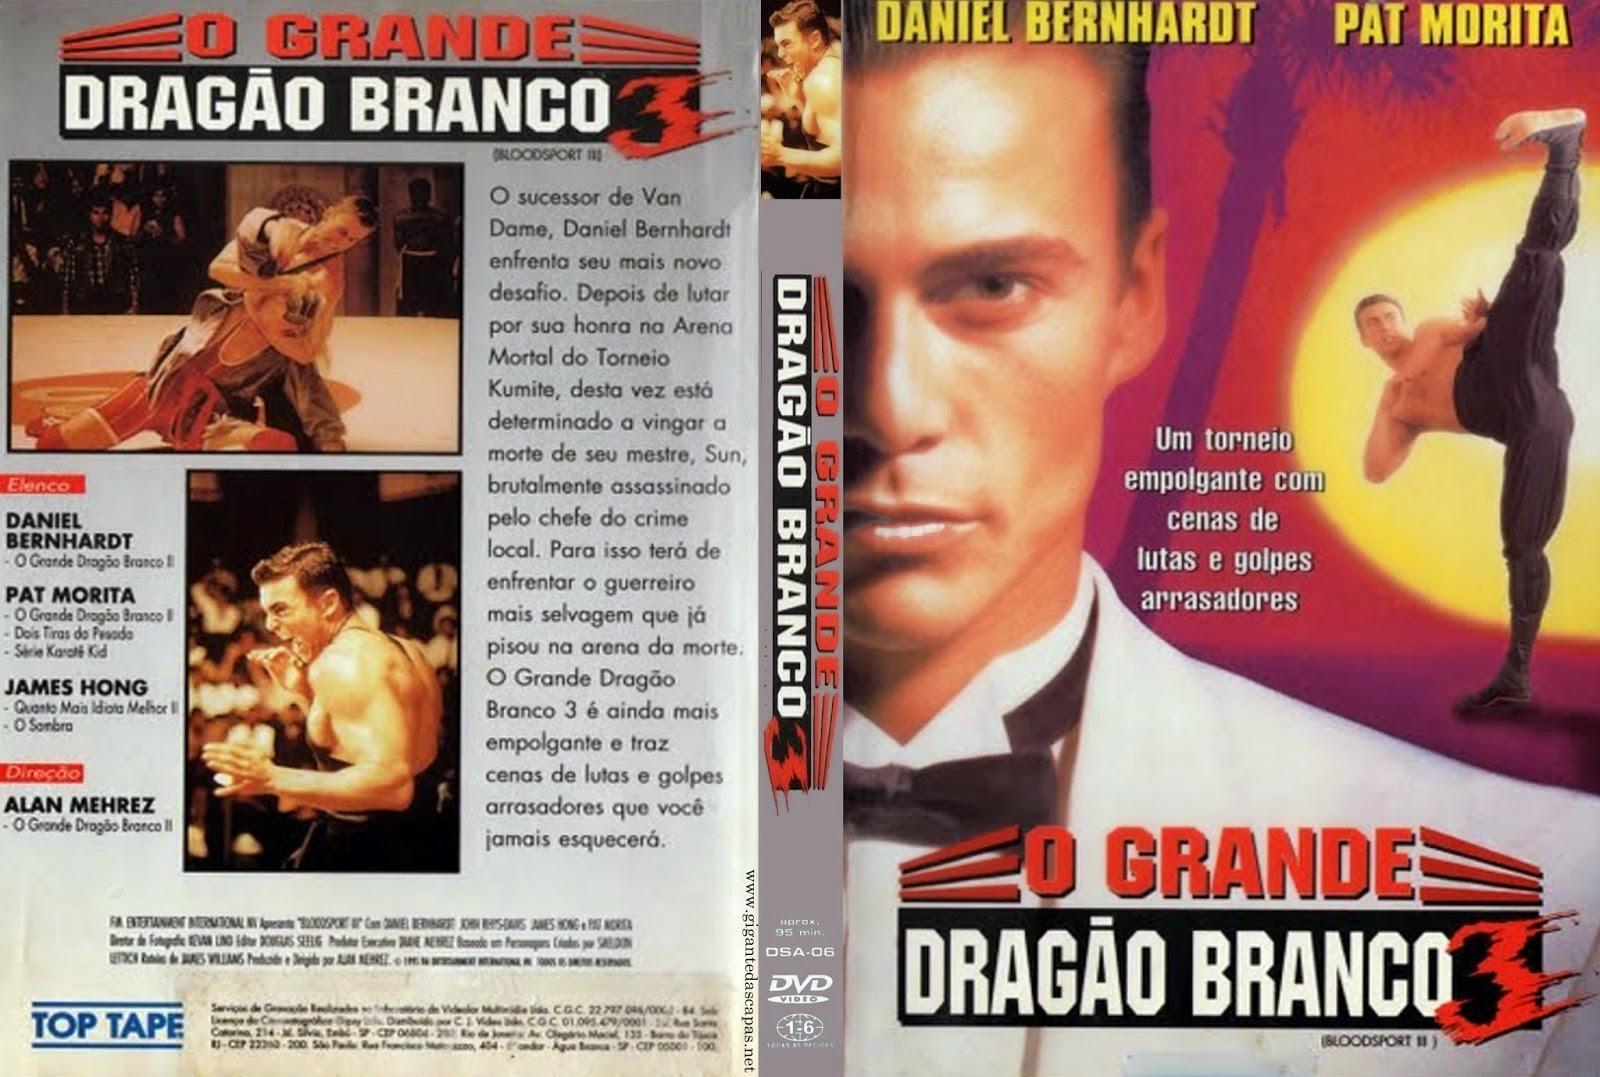 GRANDE BAIXAR DUBLADO 2 O BRANCO DRAGAO